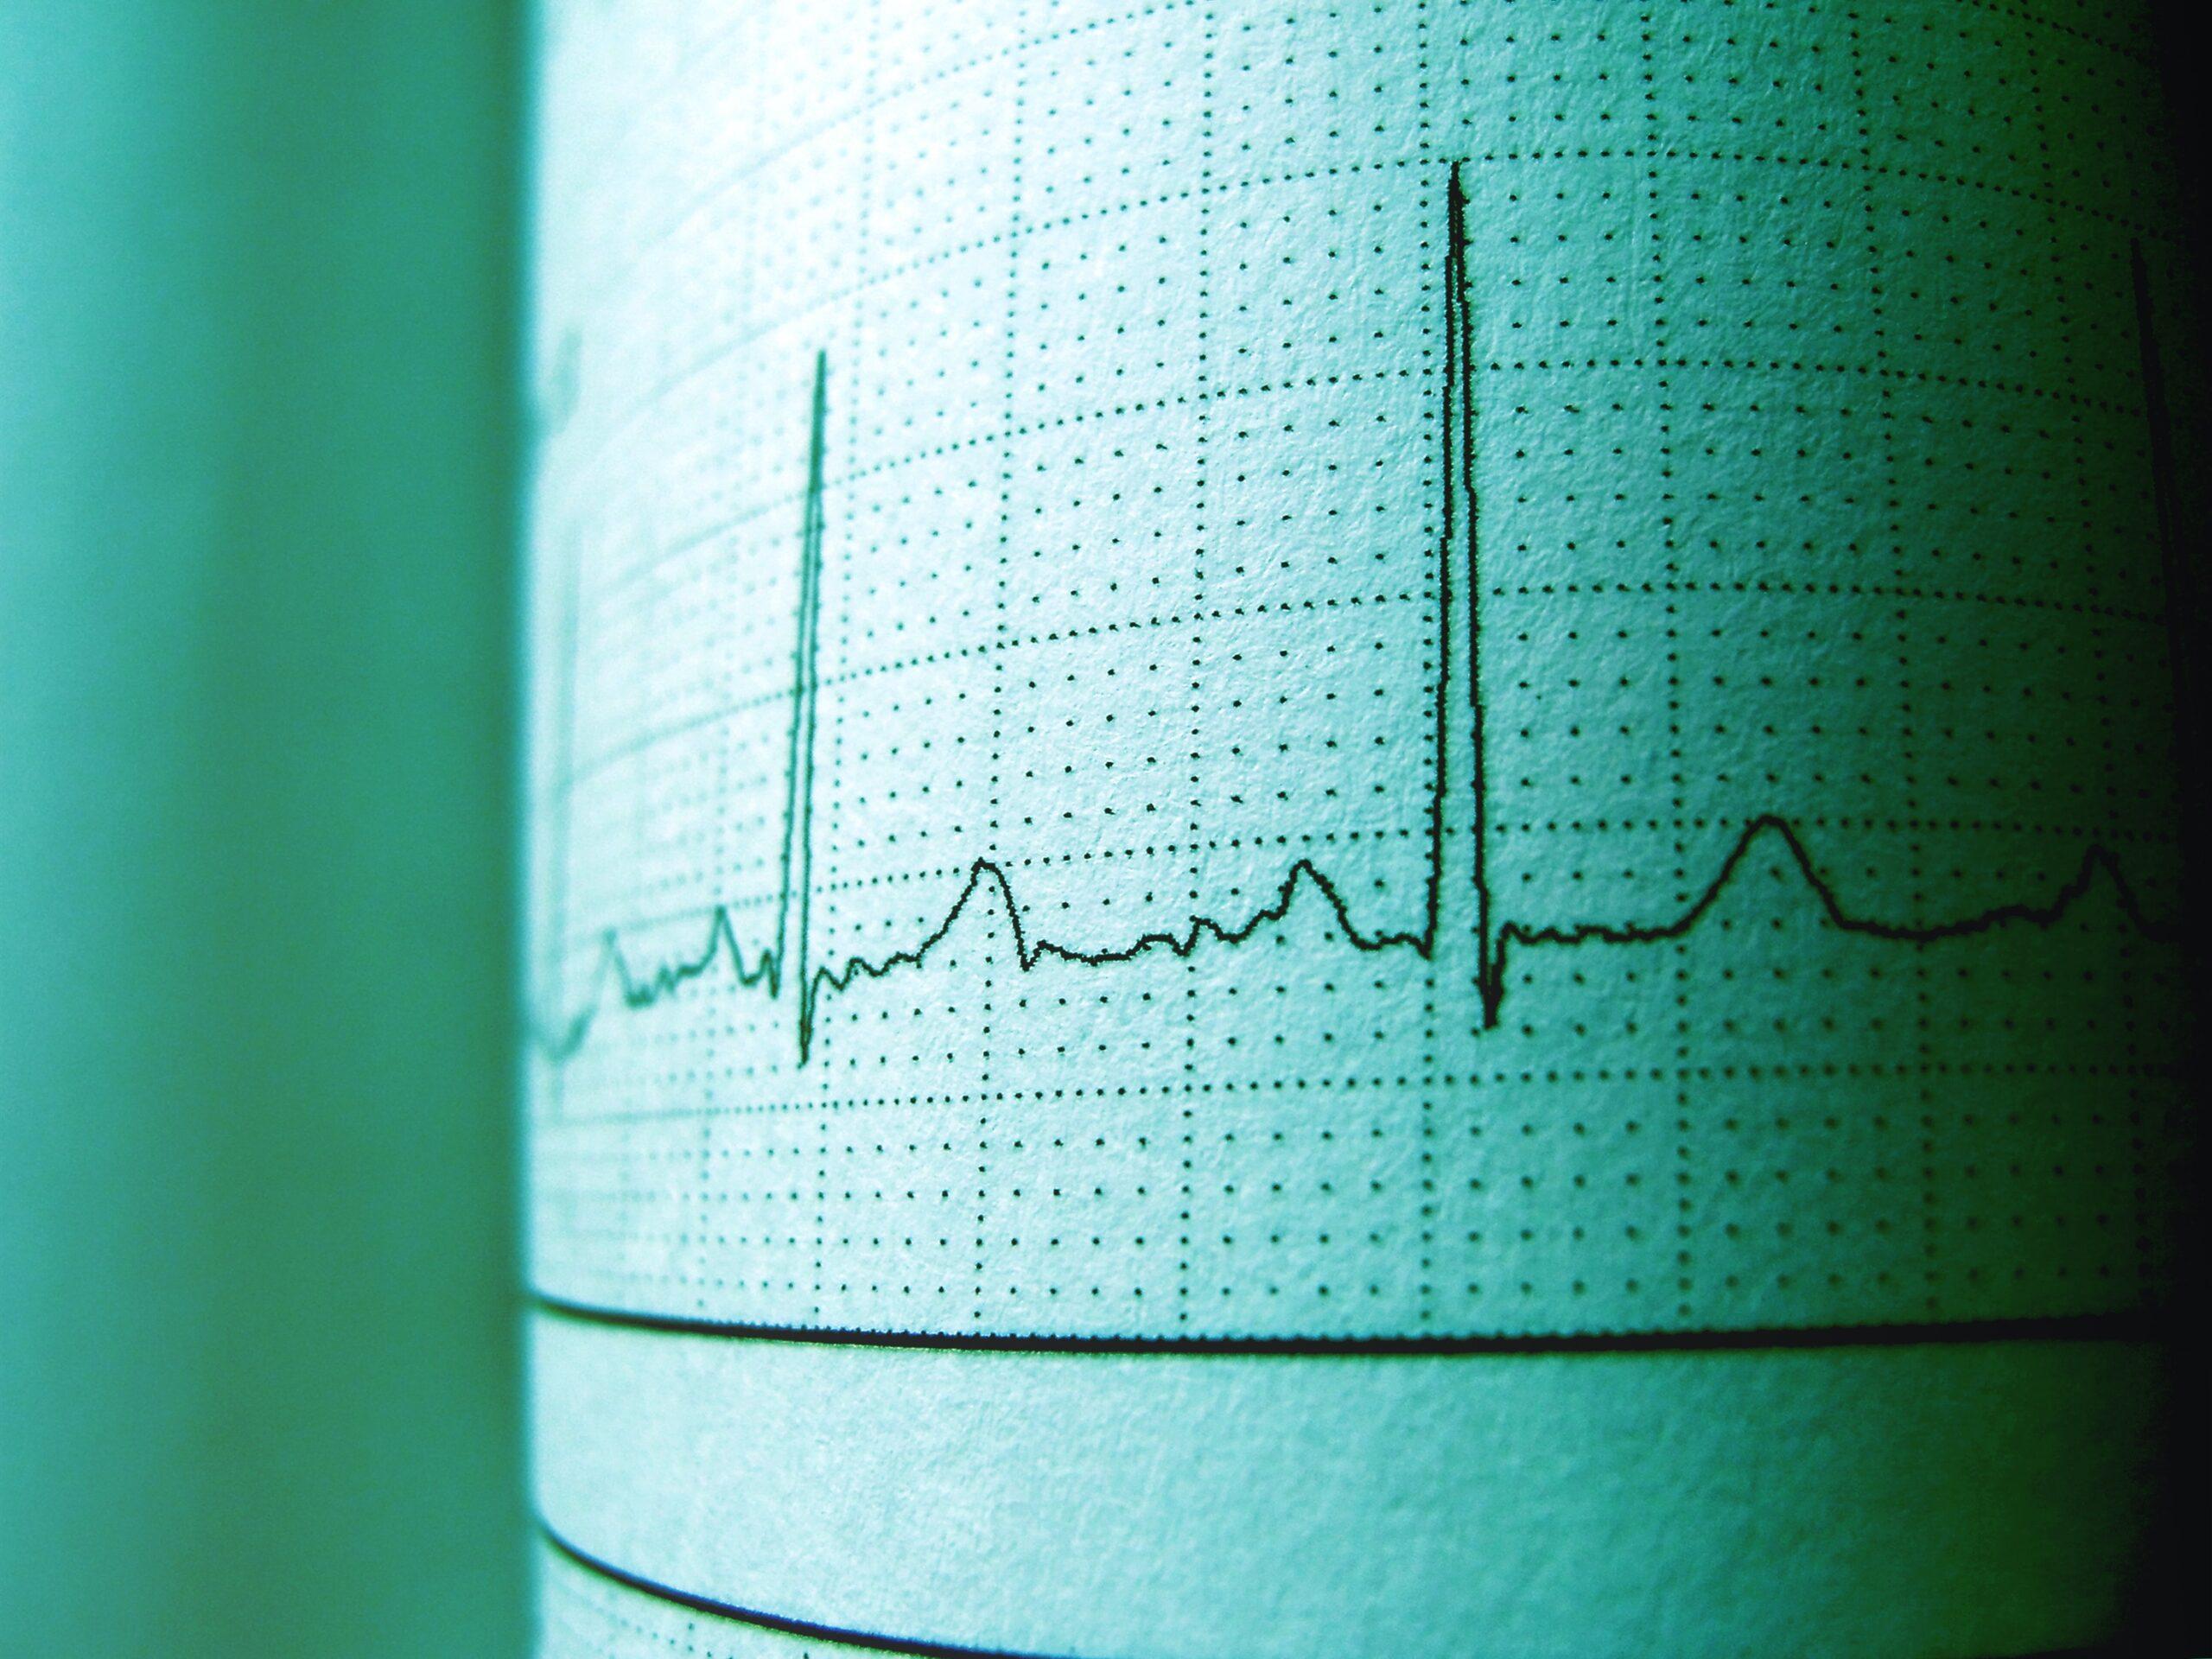 Texas Governor Signs Unique Pro-life Heartbeat Bill into Law